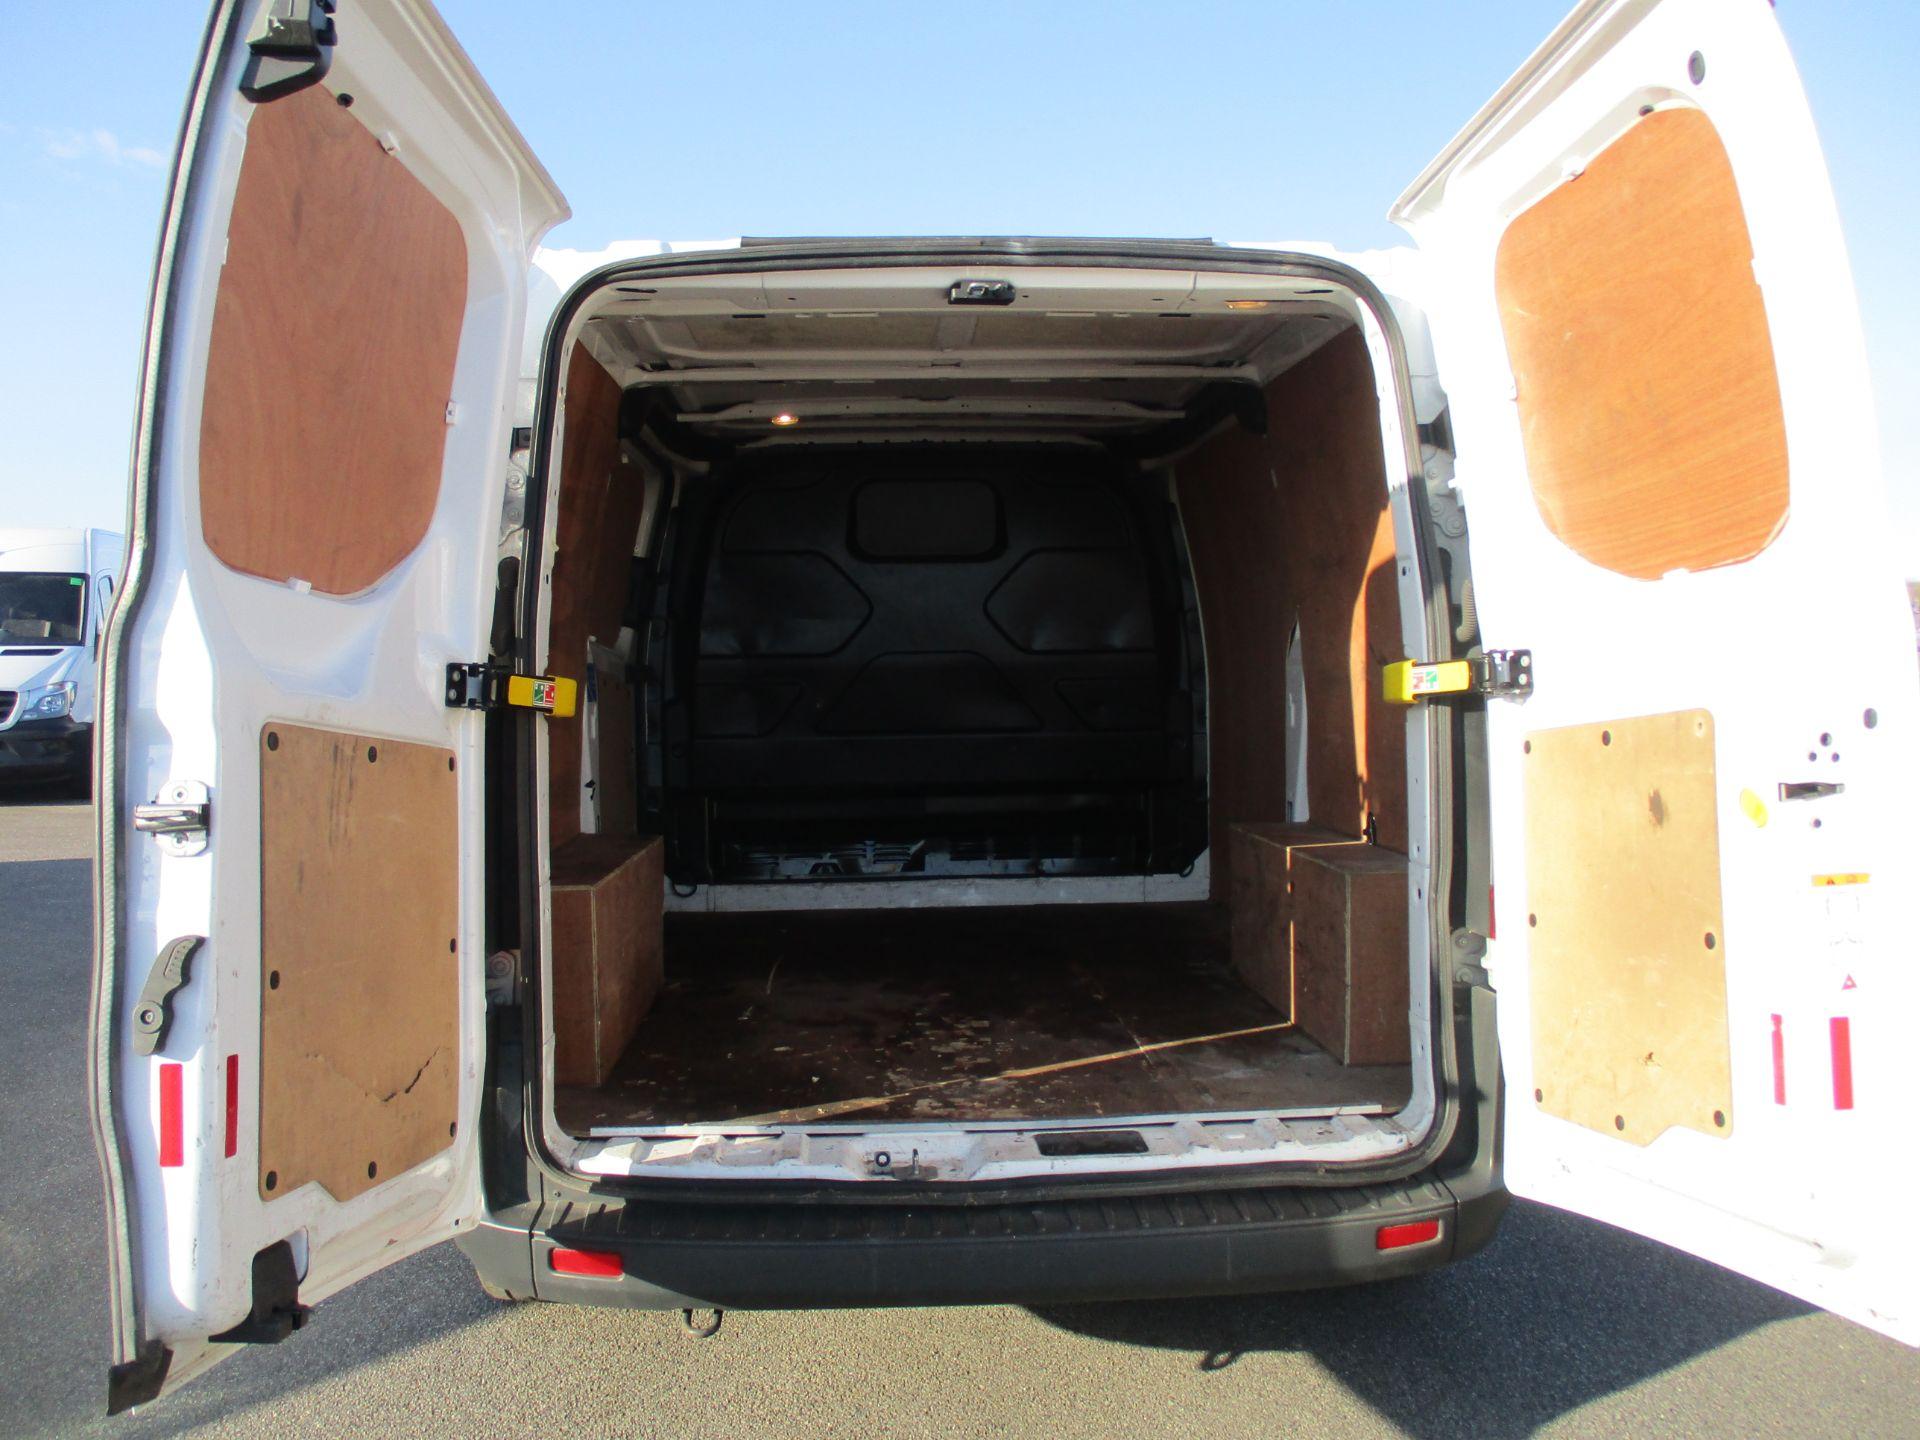 2017 Ford Transit Custom 290 L1 DIESEL FWD 2.0 TDCI 105PS LOW ROOF VAN EURO 6 (BN17PNJ) Image 10